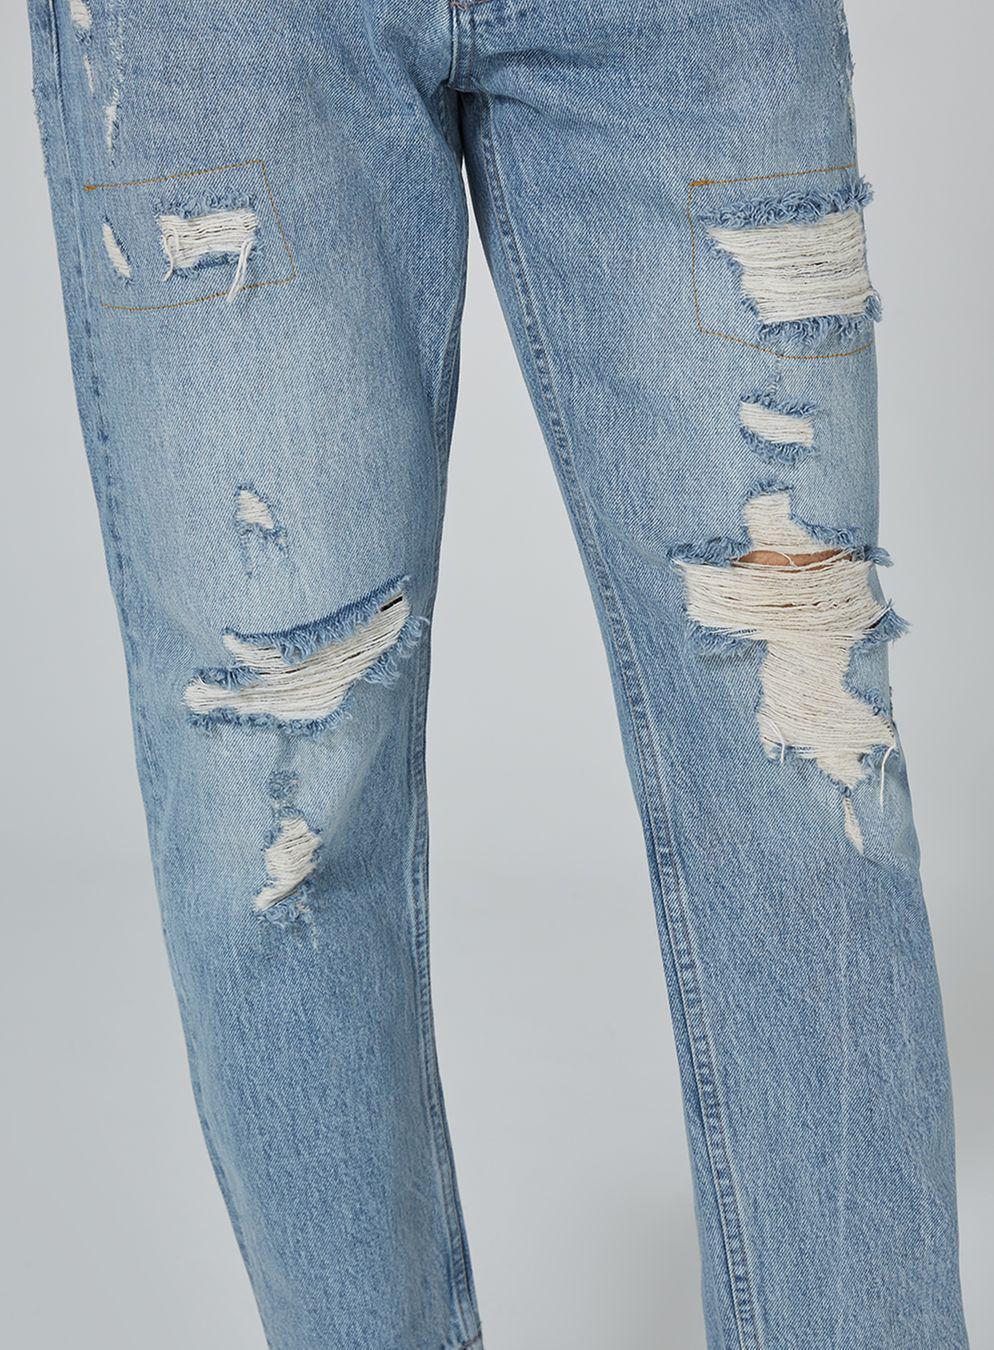 TOPMAN Denim Light Wash Original Ripped Jean in Blue for Men